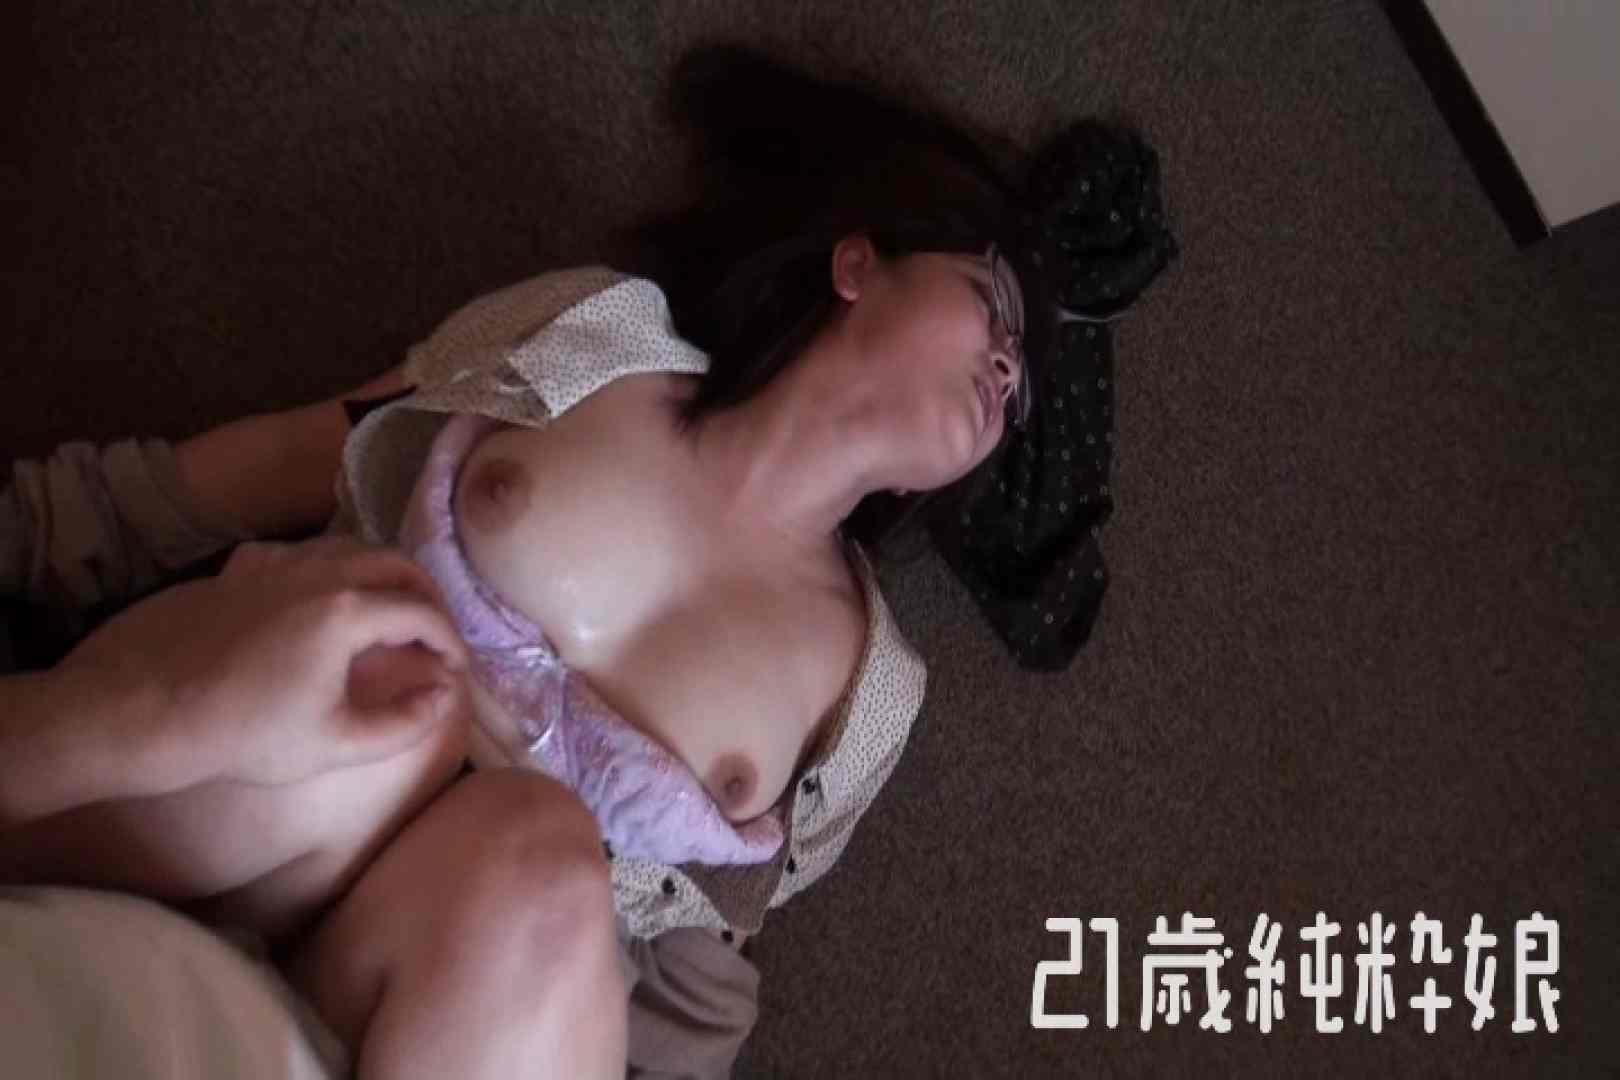 Gカップ21歳純粋嬢第2弾Vol.3 美女OL  95連発 68